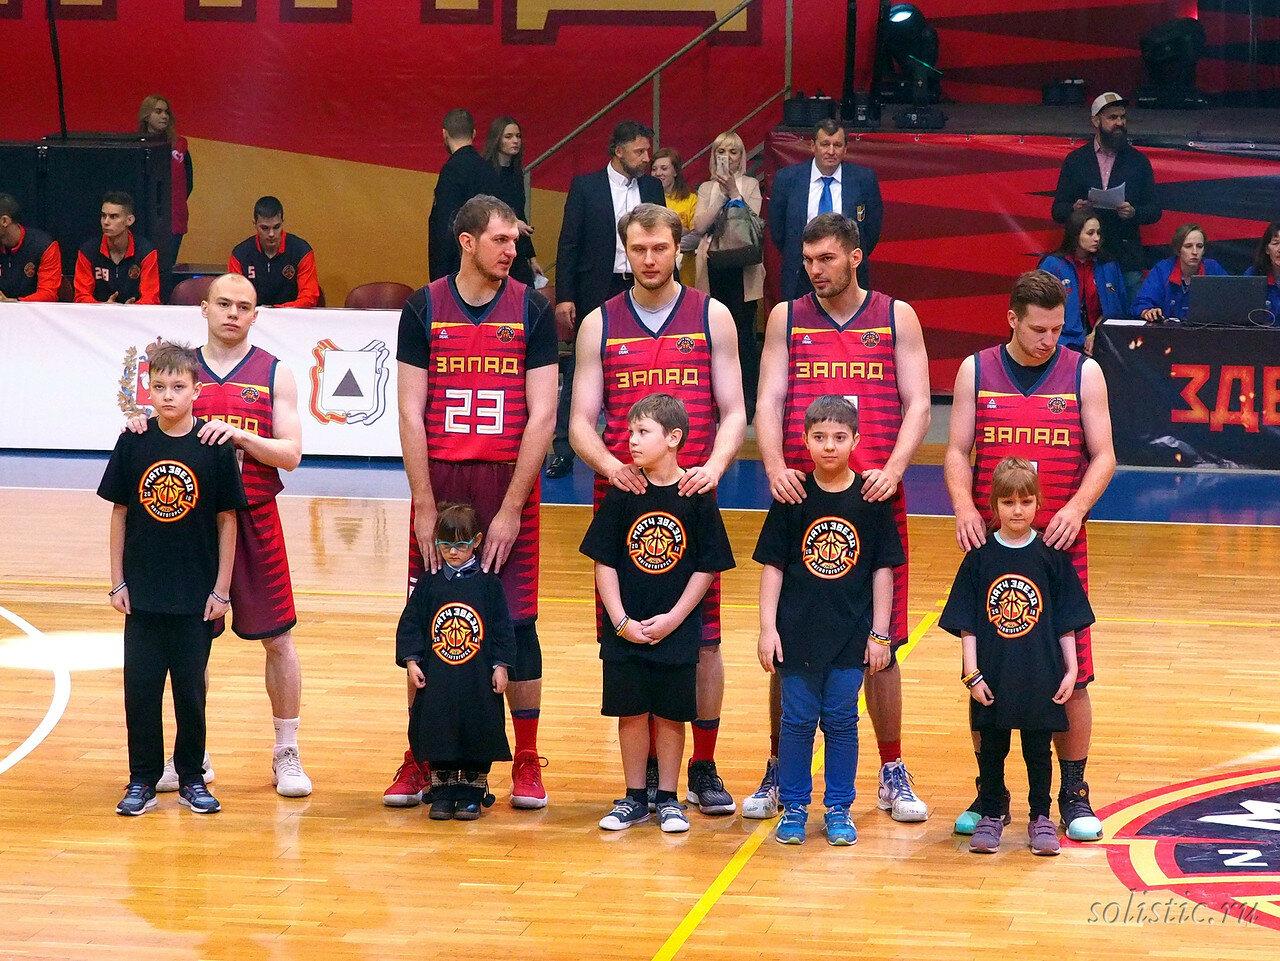 45 Матч звезд АСБ 2018 (ассоциации студенческого баскетбола)